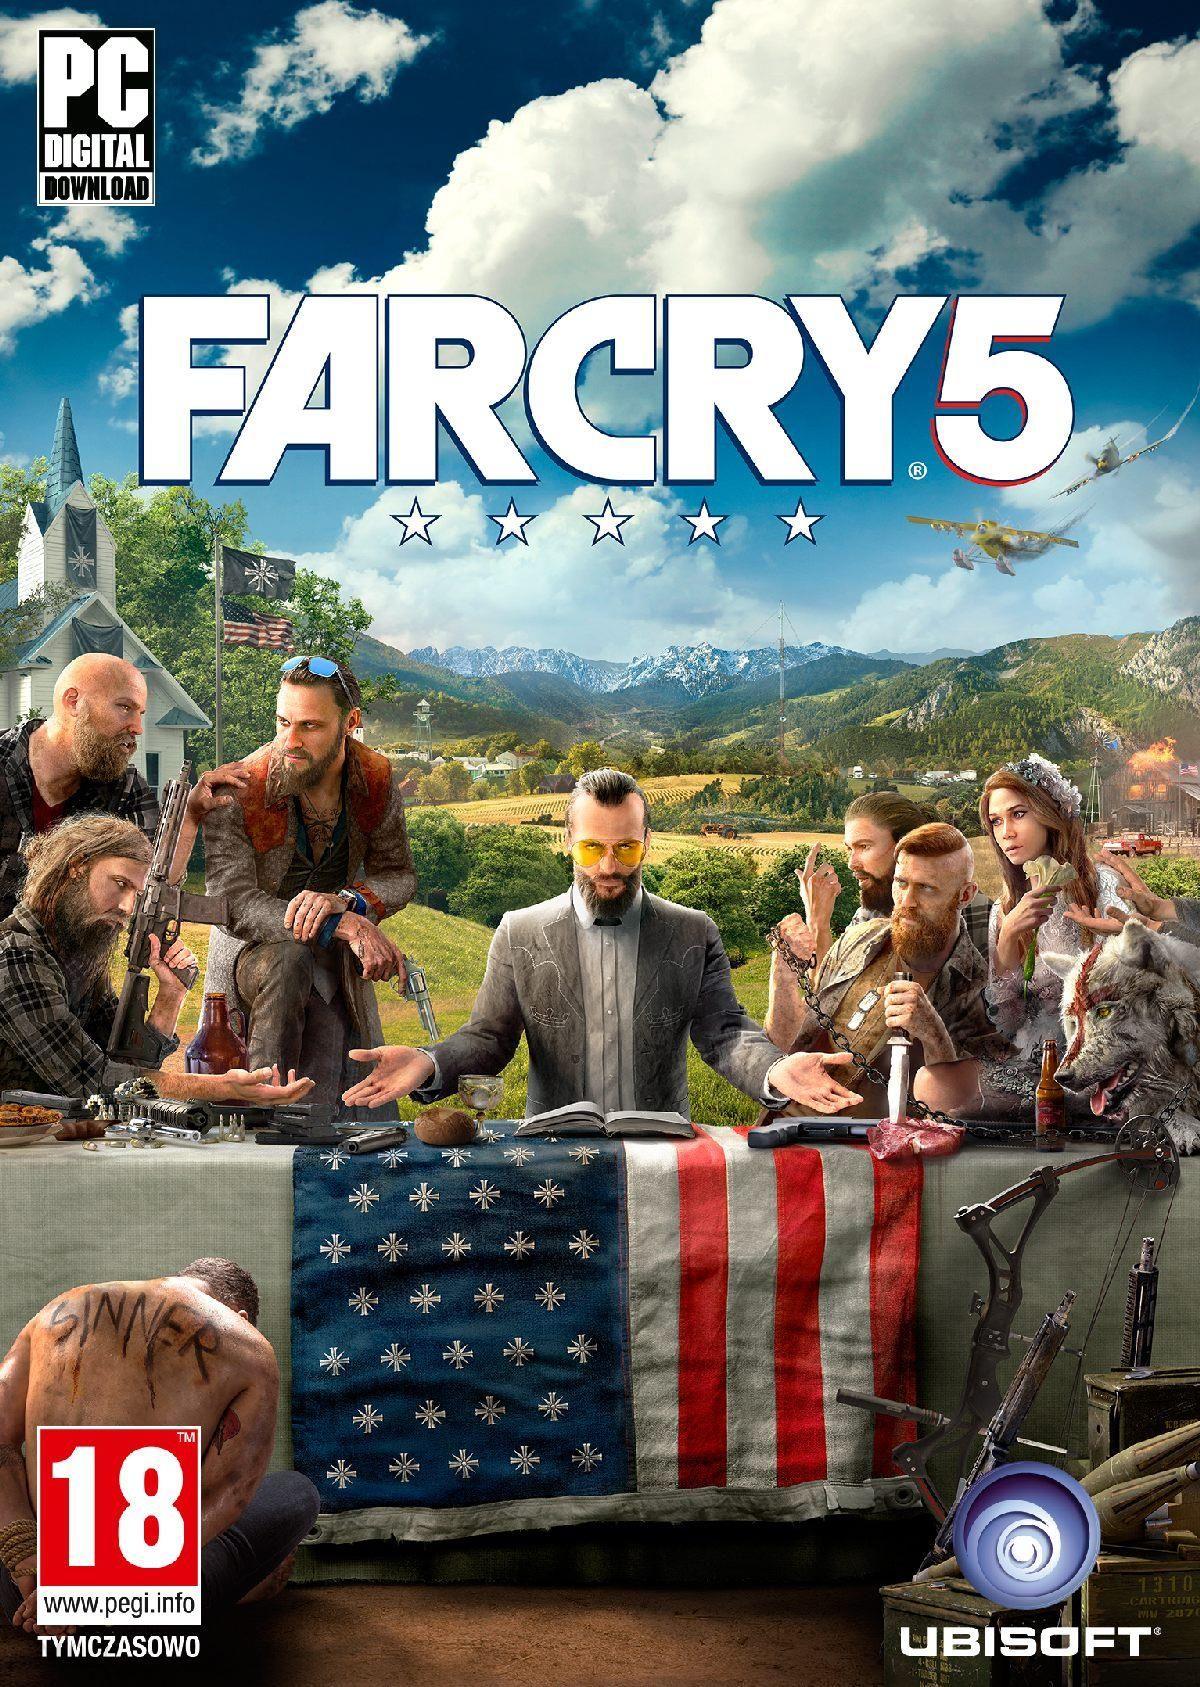 a19d8b1711dce6 Gra na PC Far Cry 5 (Gra PC) - zdjęcie 1